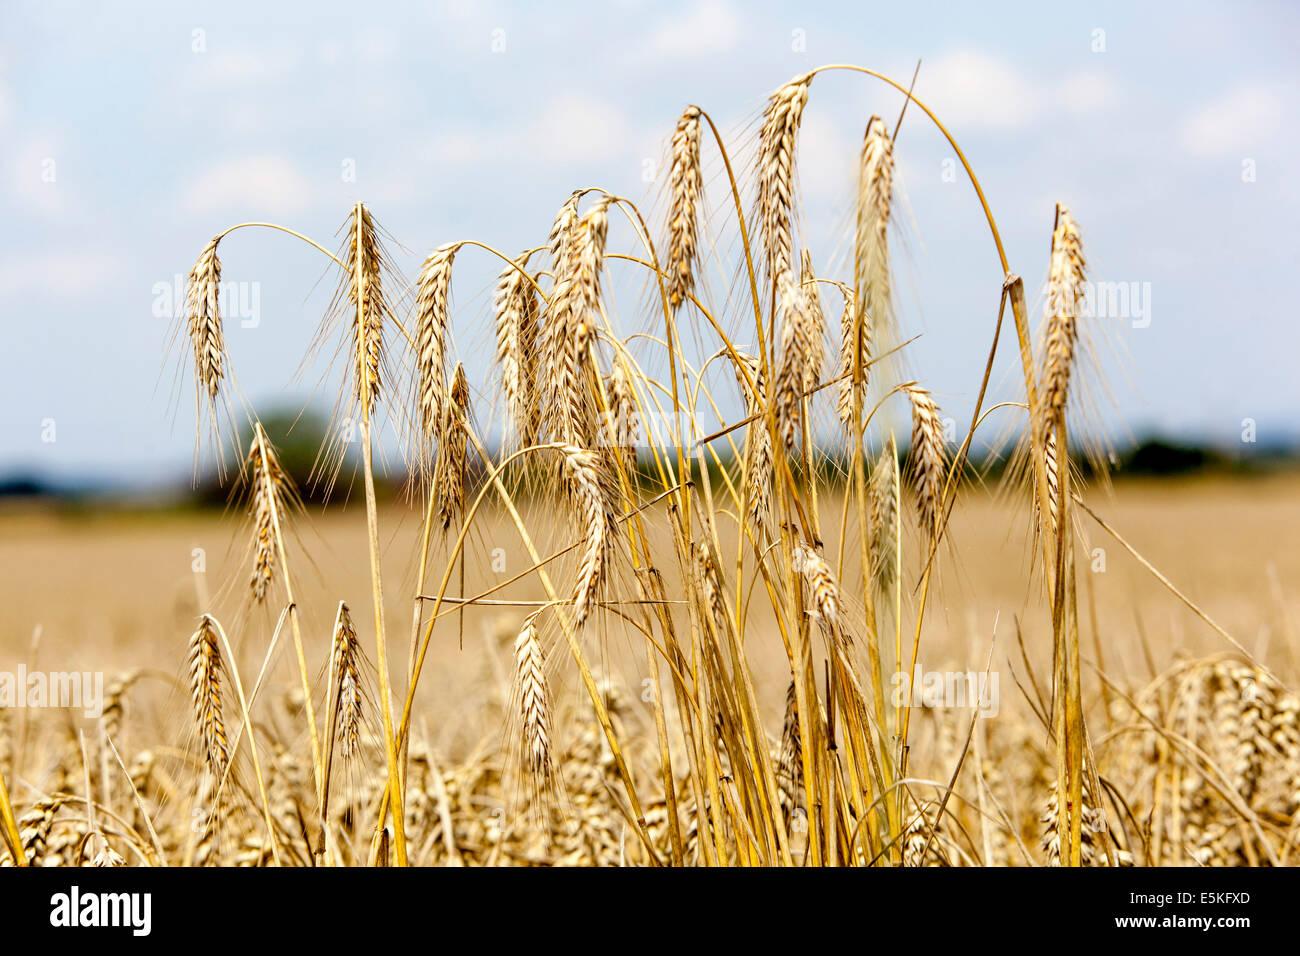 ears of wheat - Stock Image